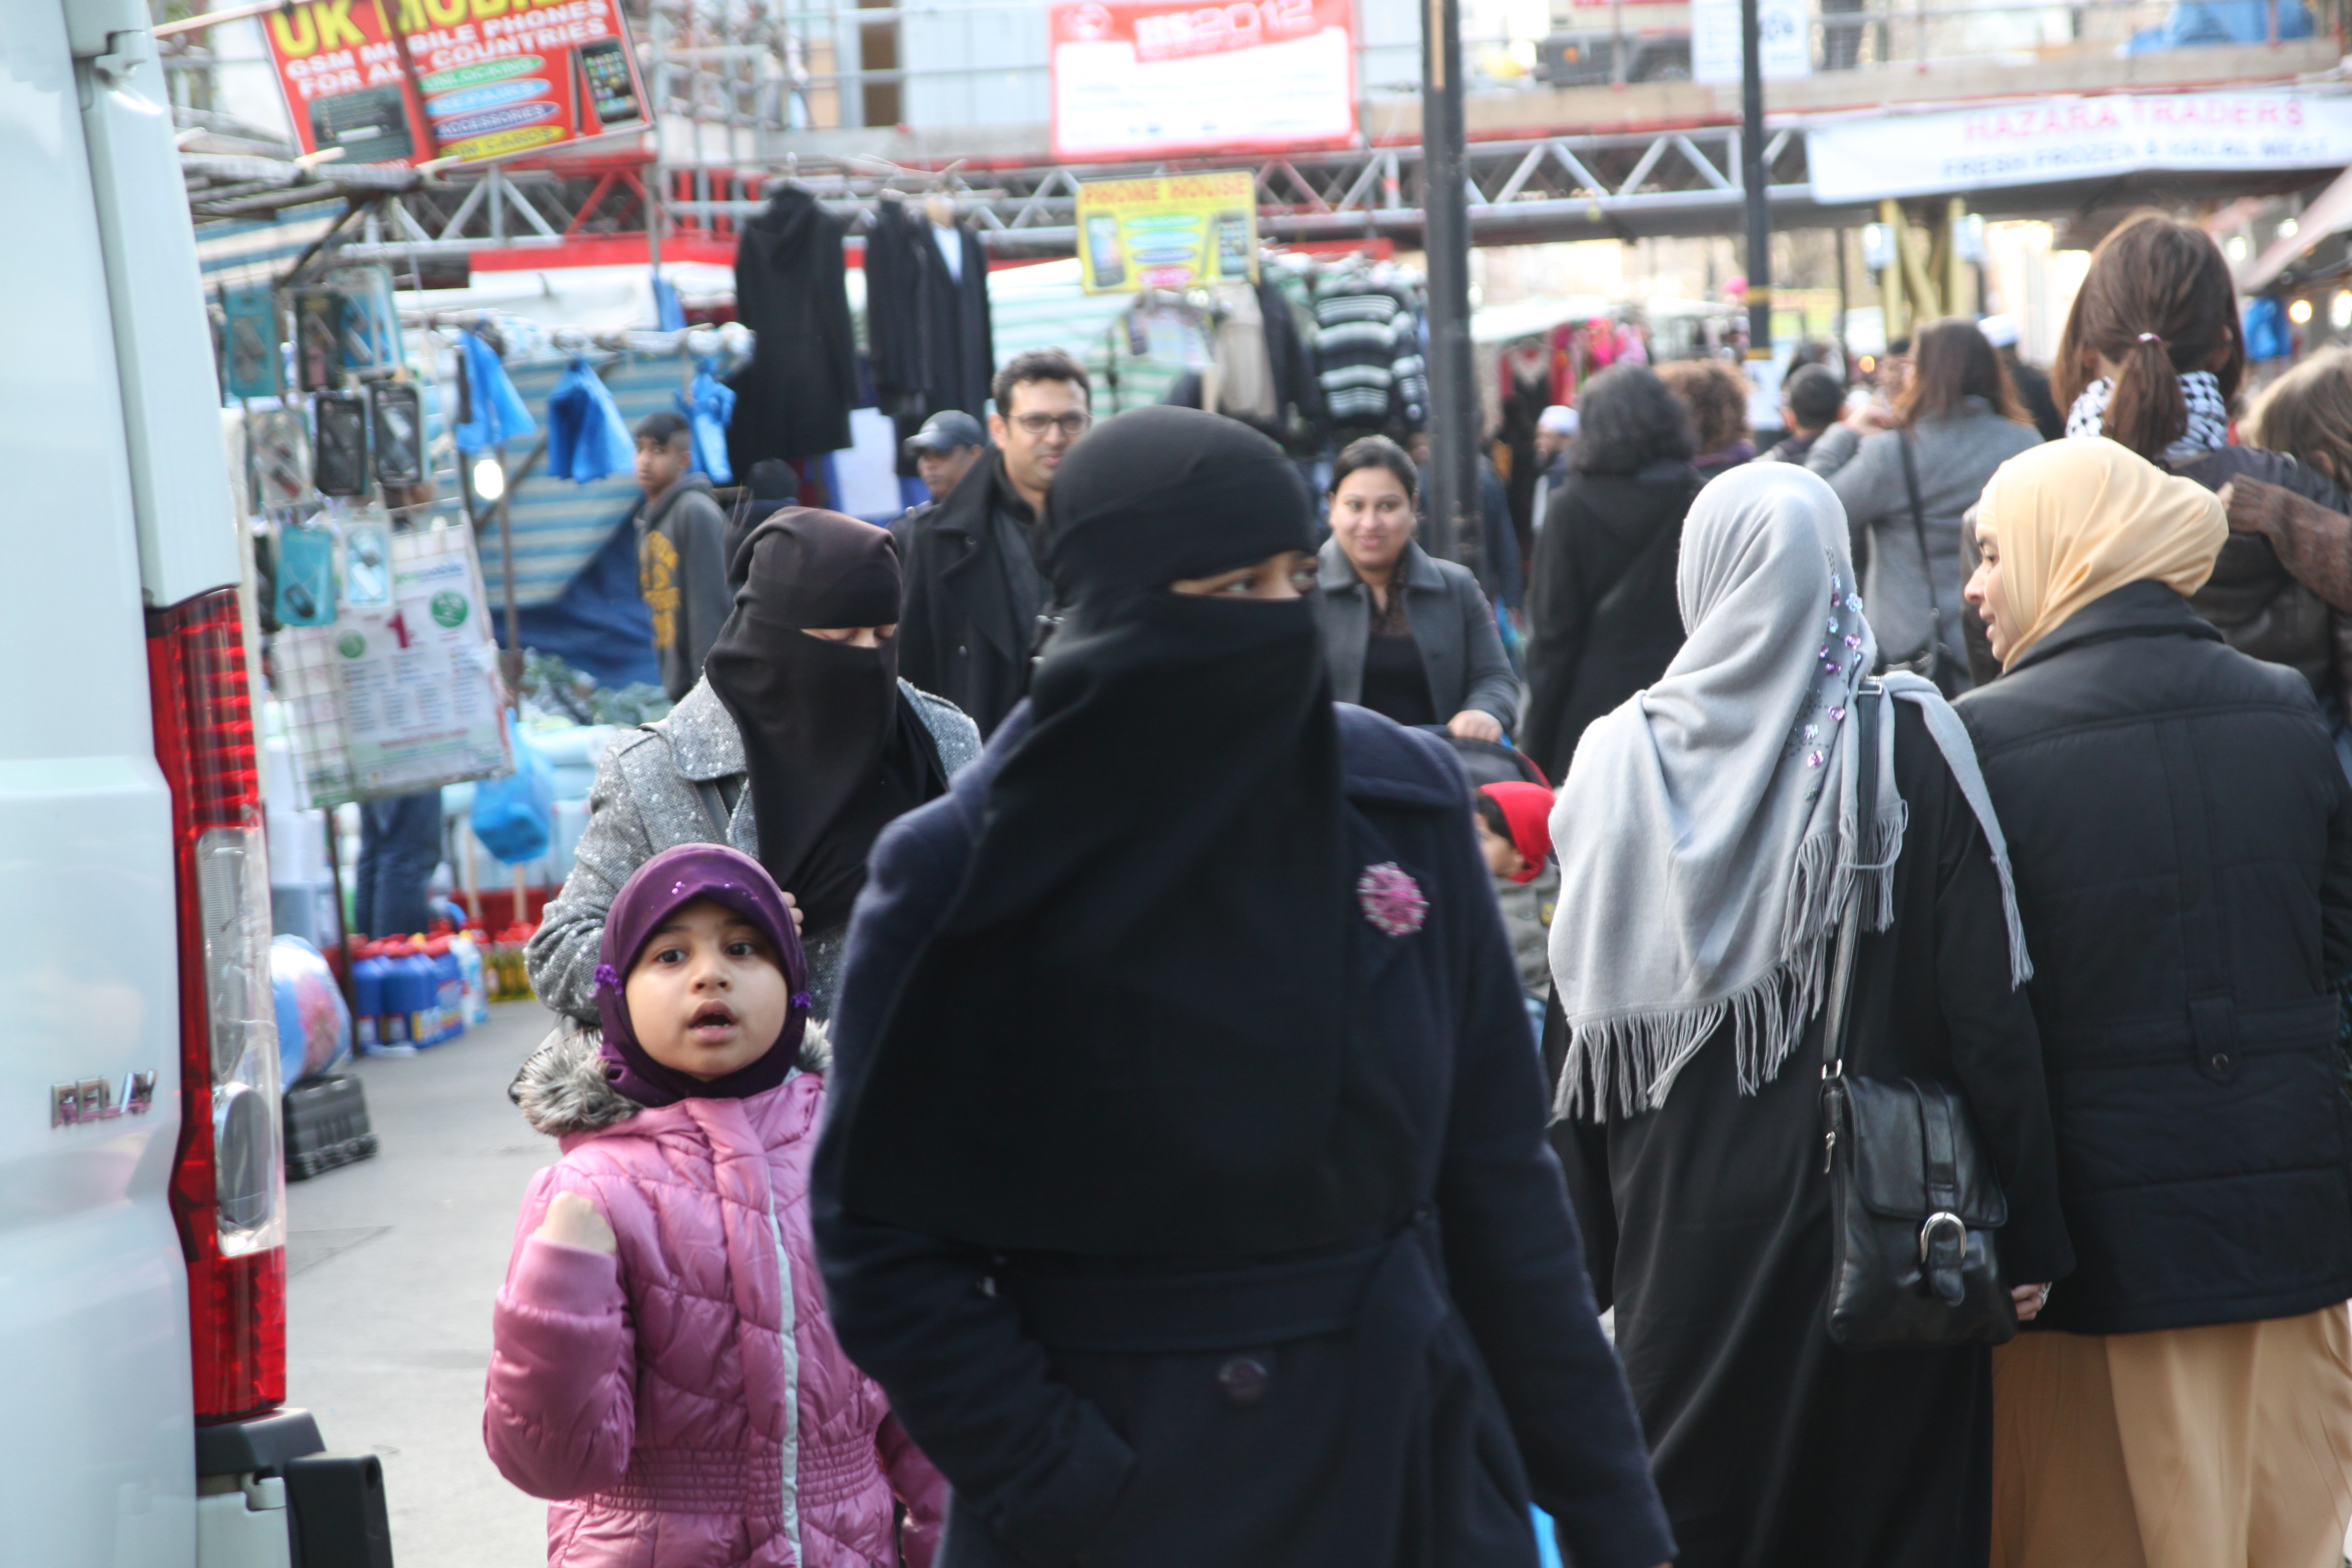 Britisk jente (5) tvunget i fosterhjem med fostermor i nikab